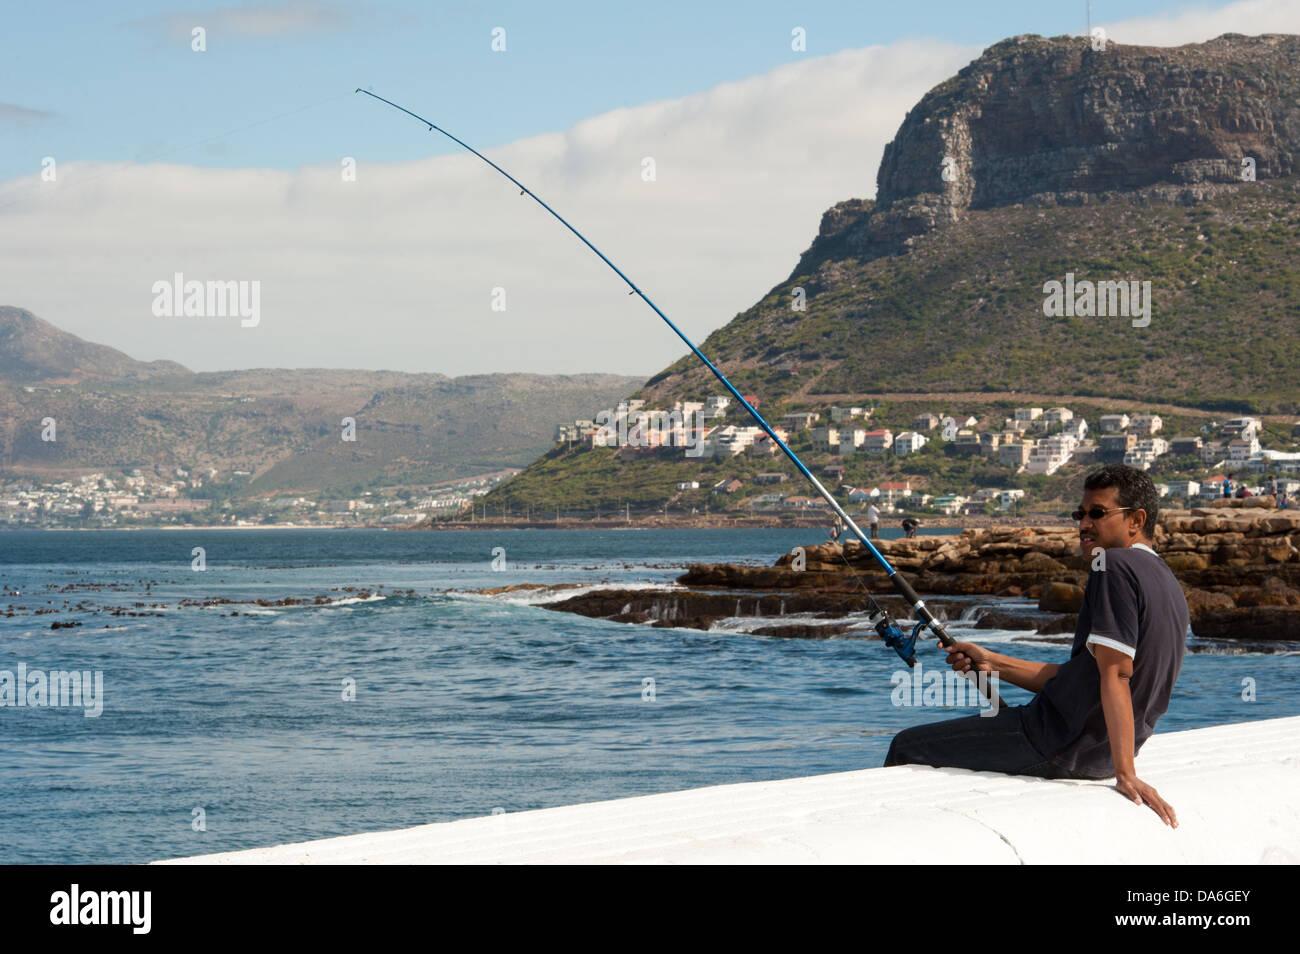 Fisherman, Kalk Bay, False Bay, South Africa - Stock Image